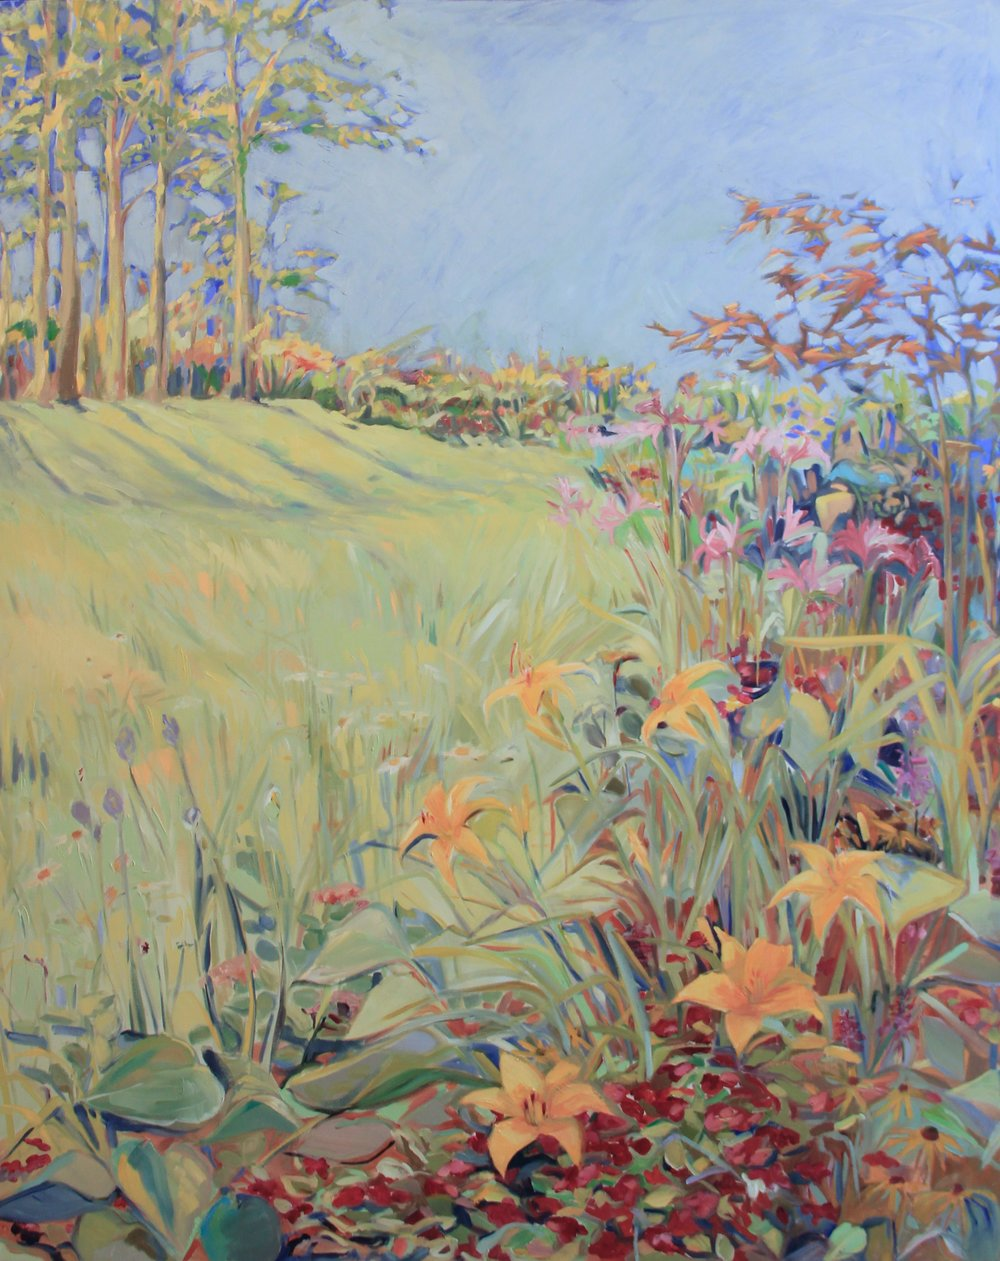 Meadow Garden, Oil on Canvas, 60 x 48